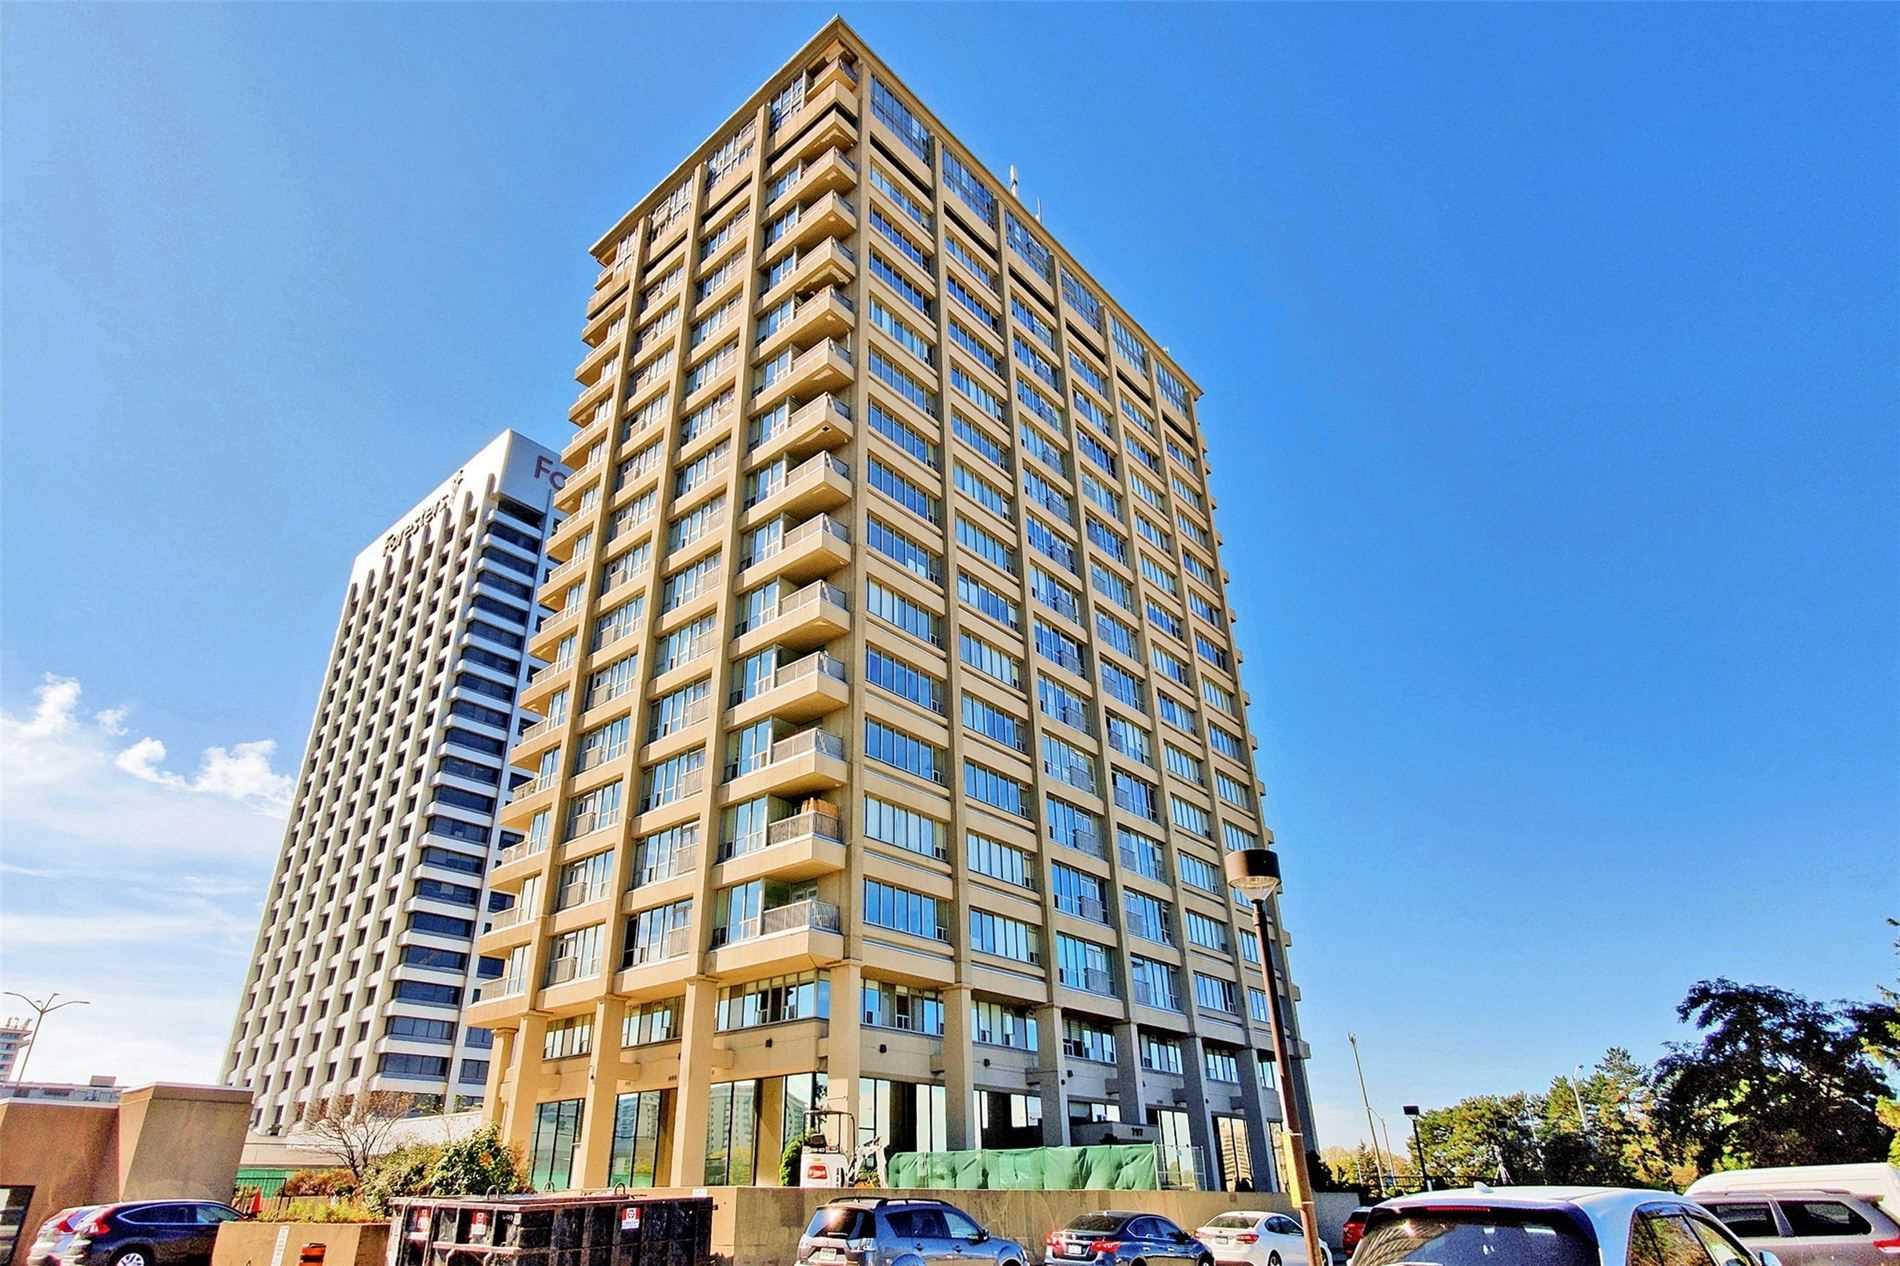 797 Don Mills Rd, Toronto, Ontario M3C1V2, 2 Bedrooms Bedrooms, 6 Rooms Rooms,2 BathroomsBathrooms,Condo Apt,For Sale,Don Mills,C5376623